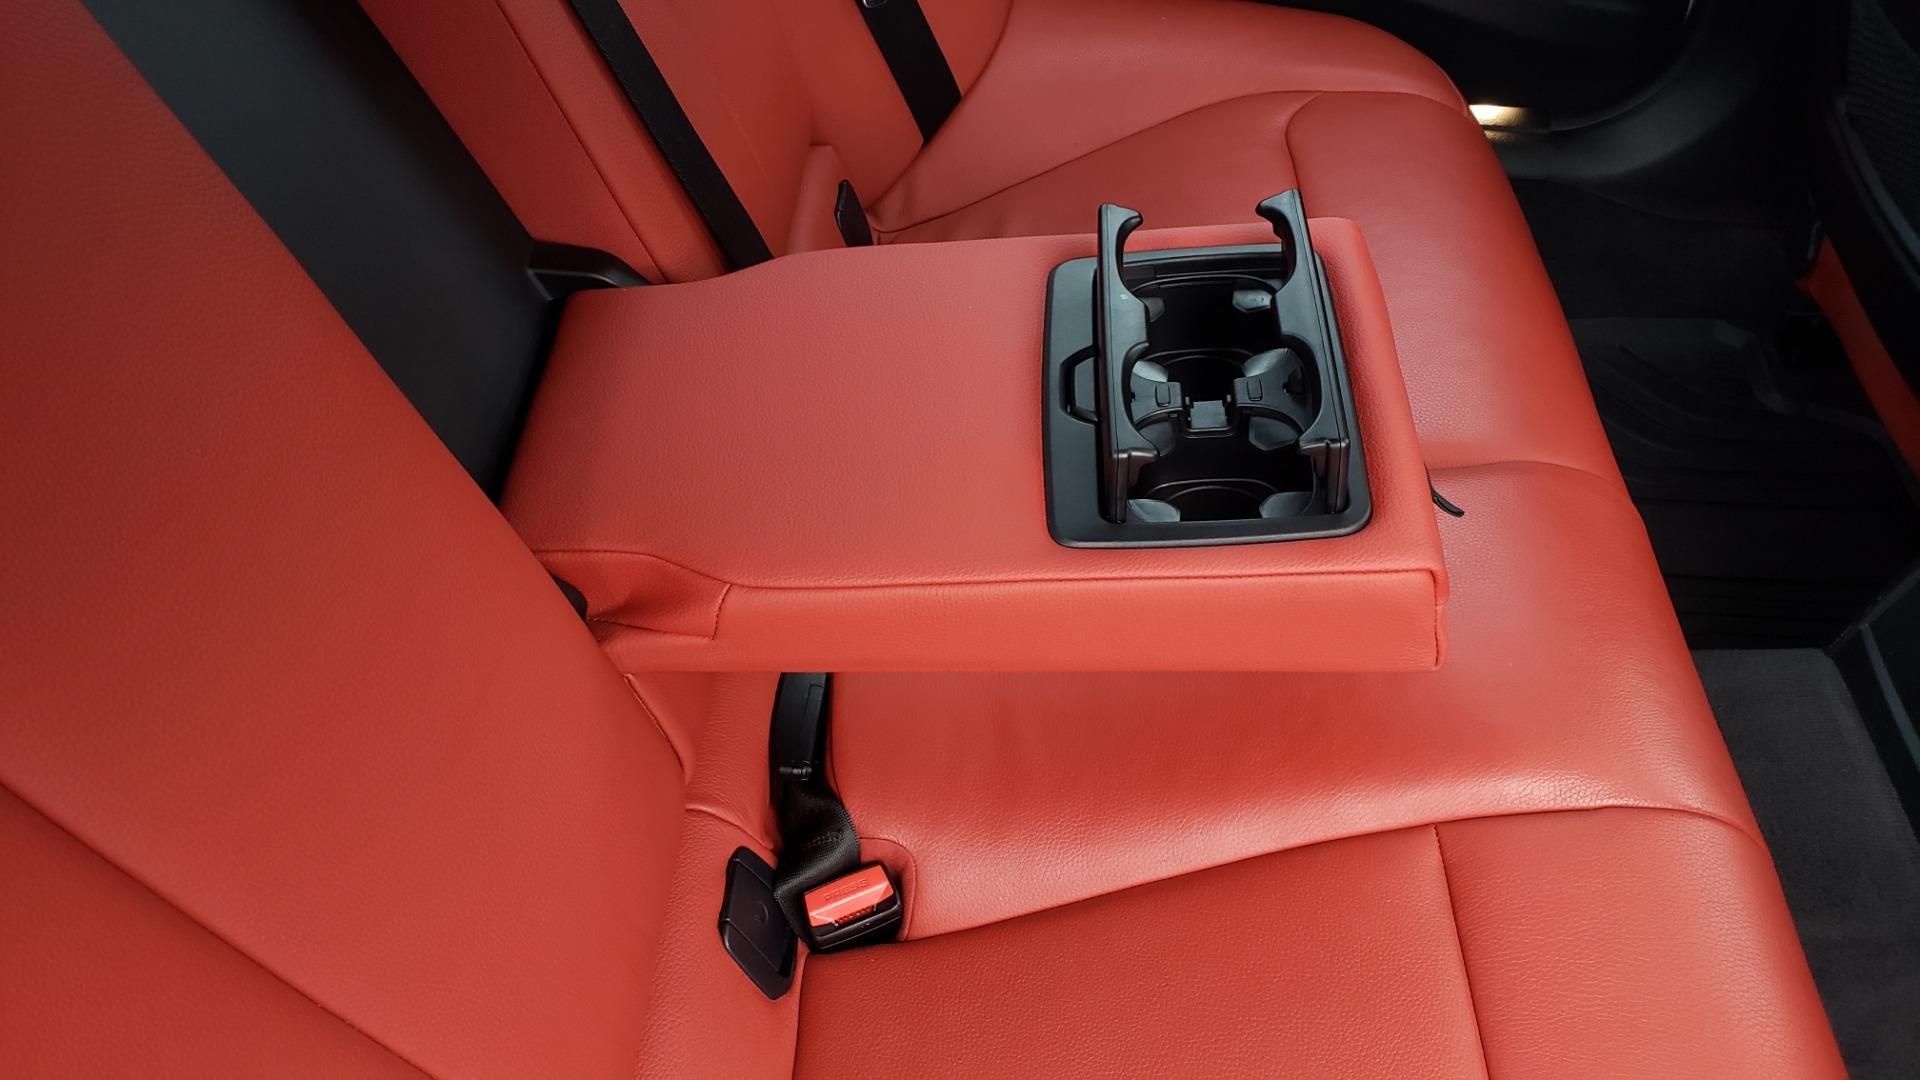 Used 2015 BMW 3 Series 335I M-SPORT / PREM PKG / HK SND / SUNROOF / REARVIEW for sale Sold at Formula Imports in Charlotte NC 28227 72